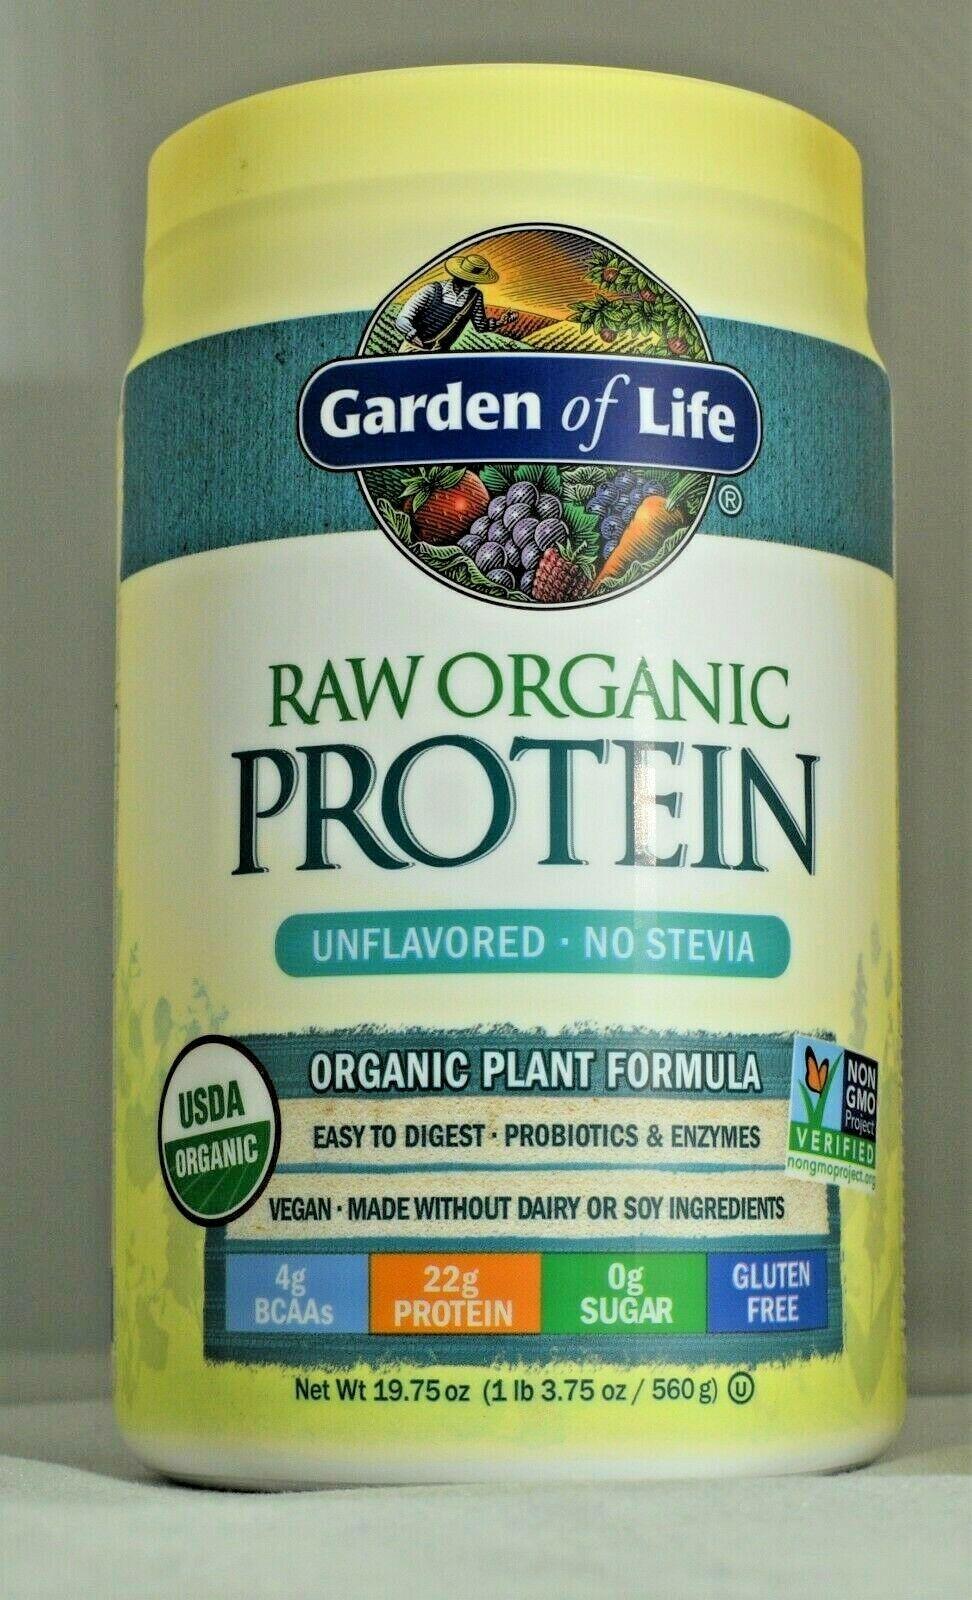 Garden of Life Organic Vegan Protein Powder with Vitamins an